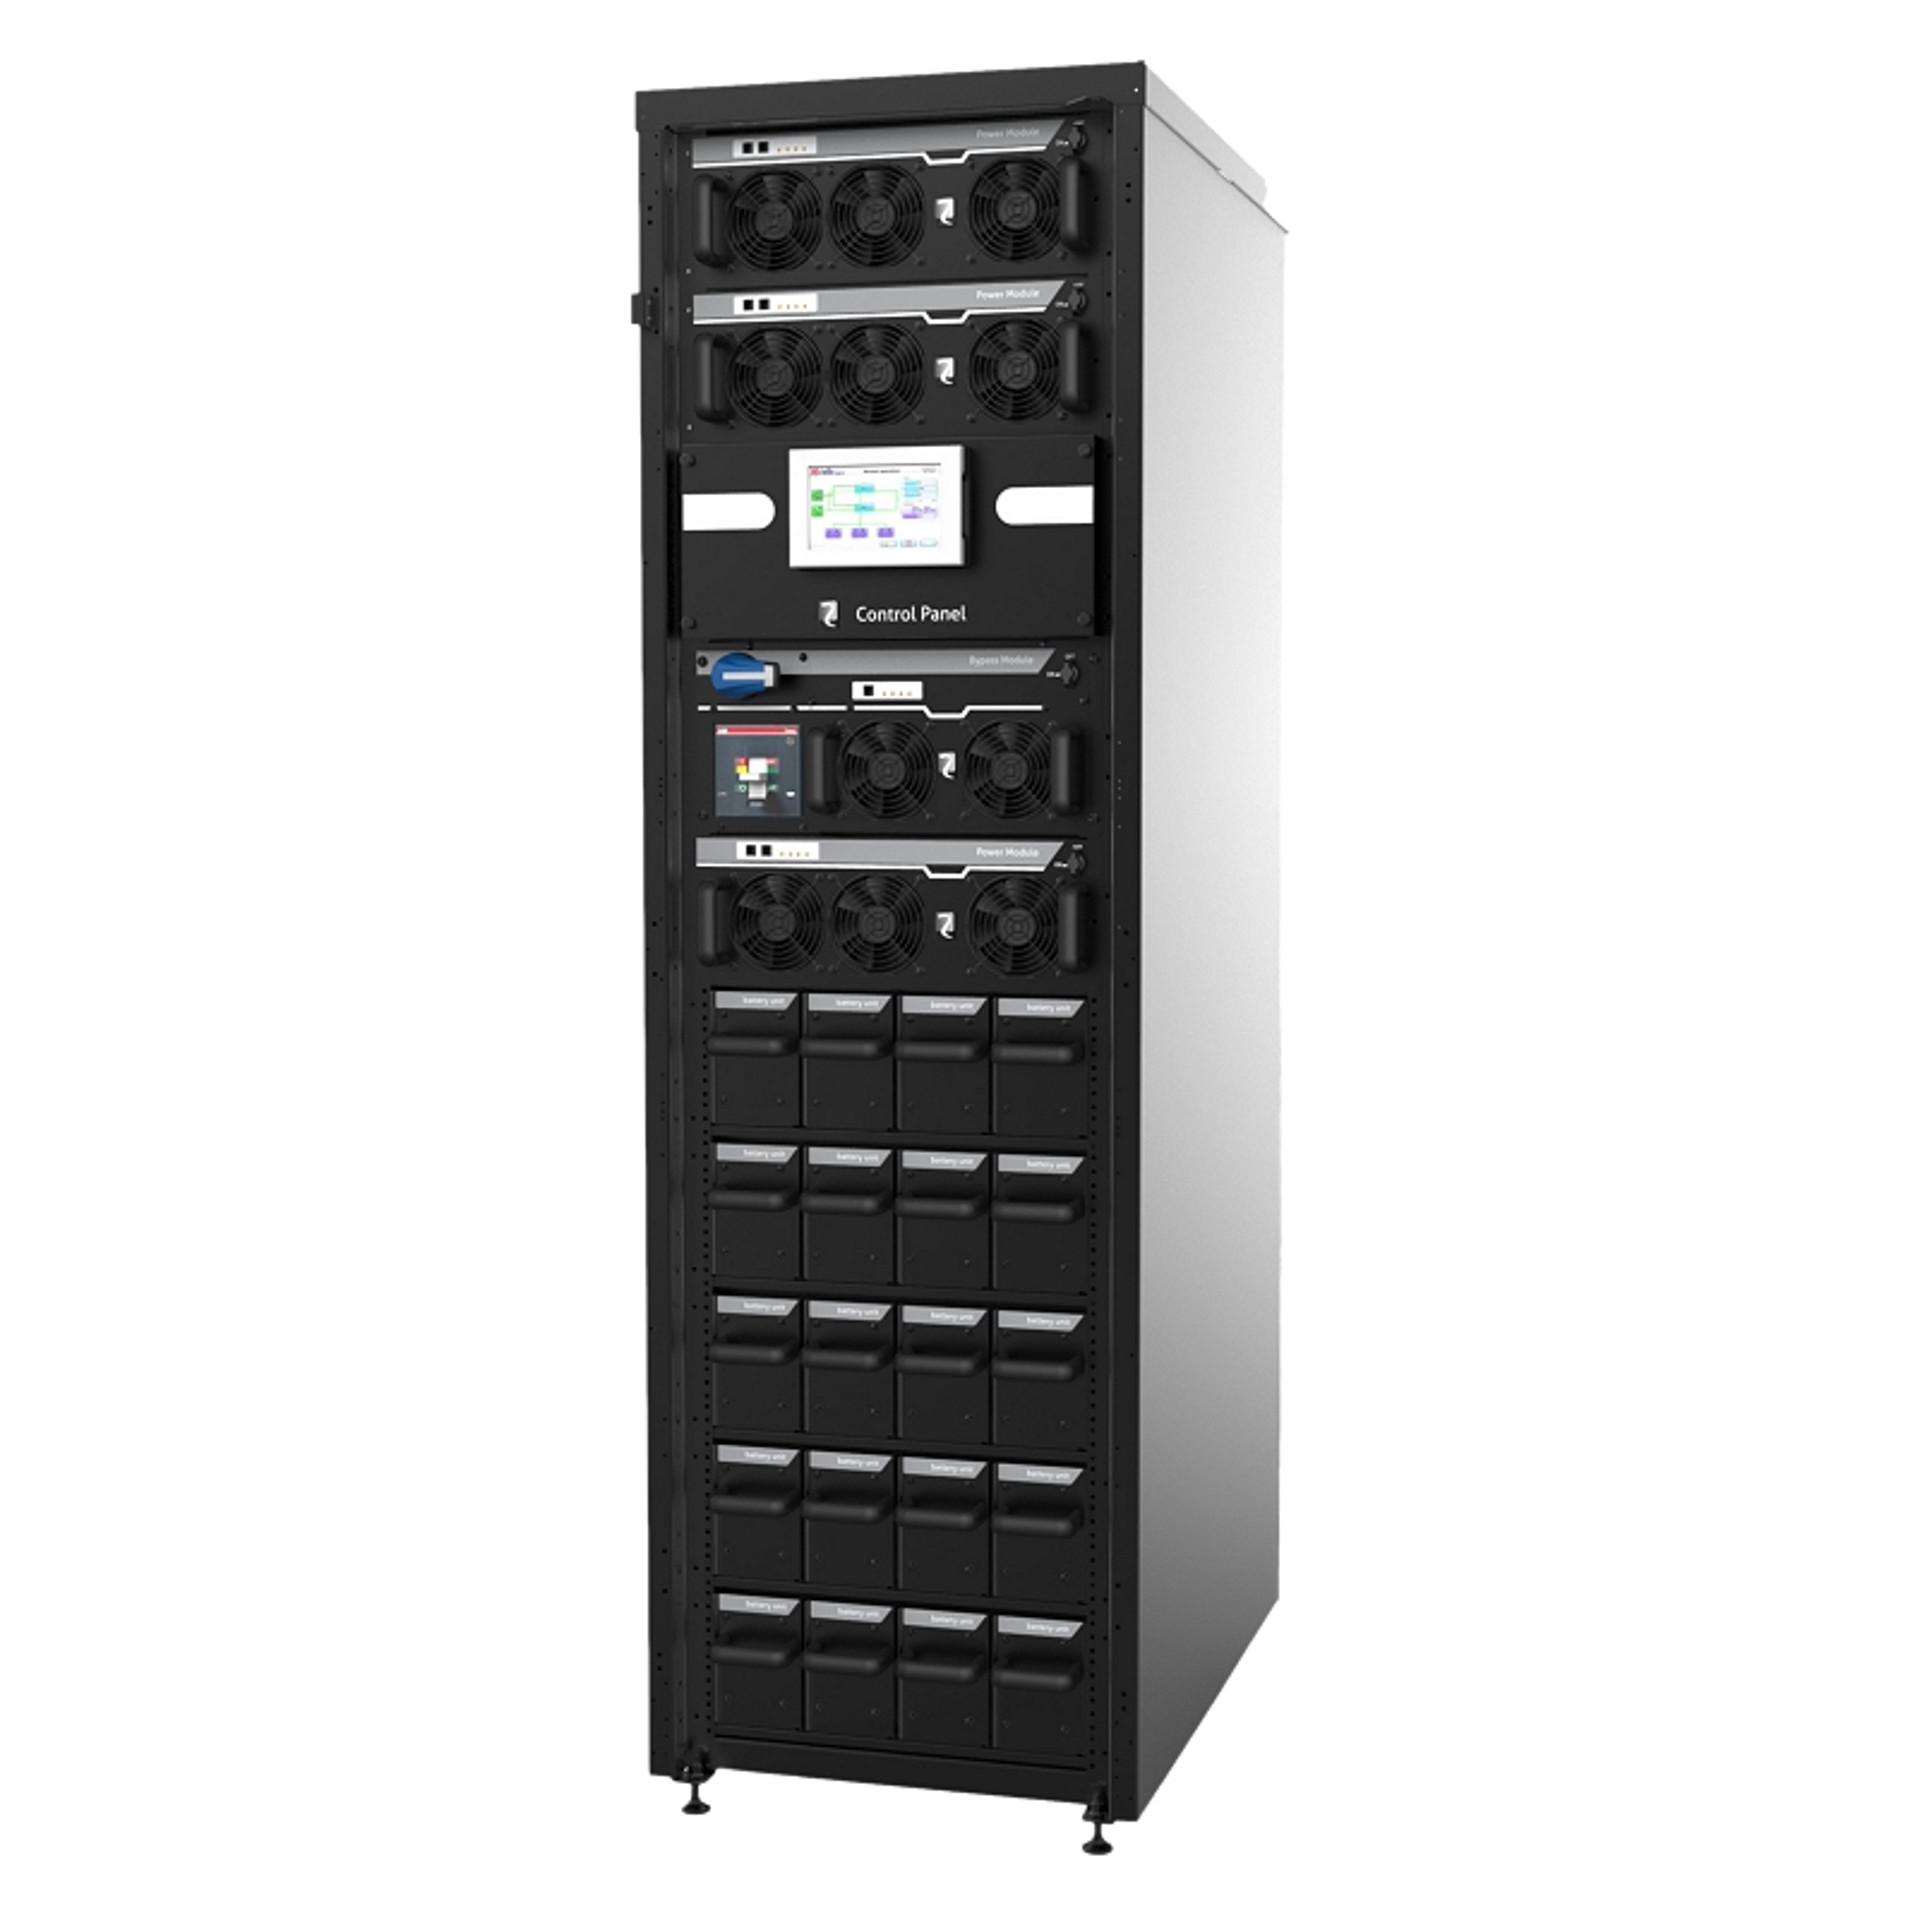 multi power n 1 2x42 kw modulare serverraum usvs bellequip. Black Bedroom Furniture Sets. Home Design Ideas